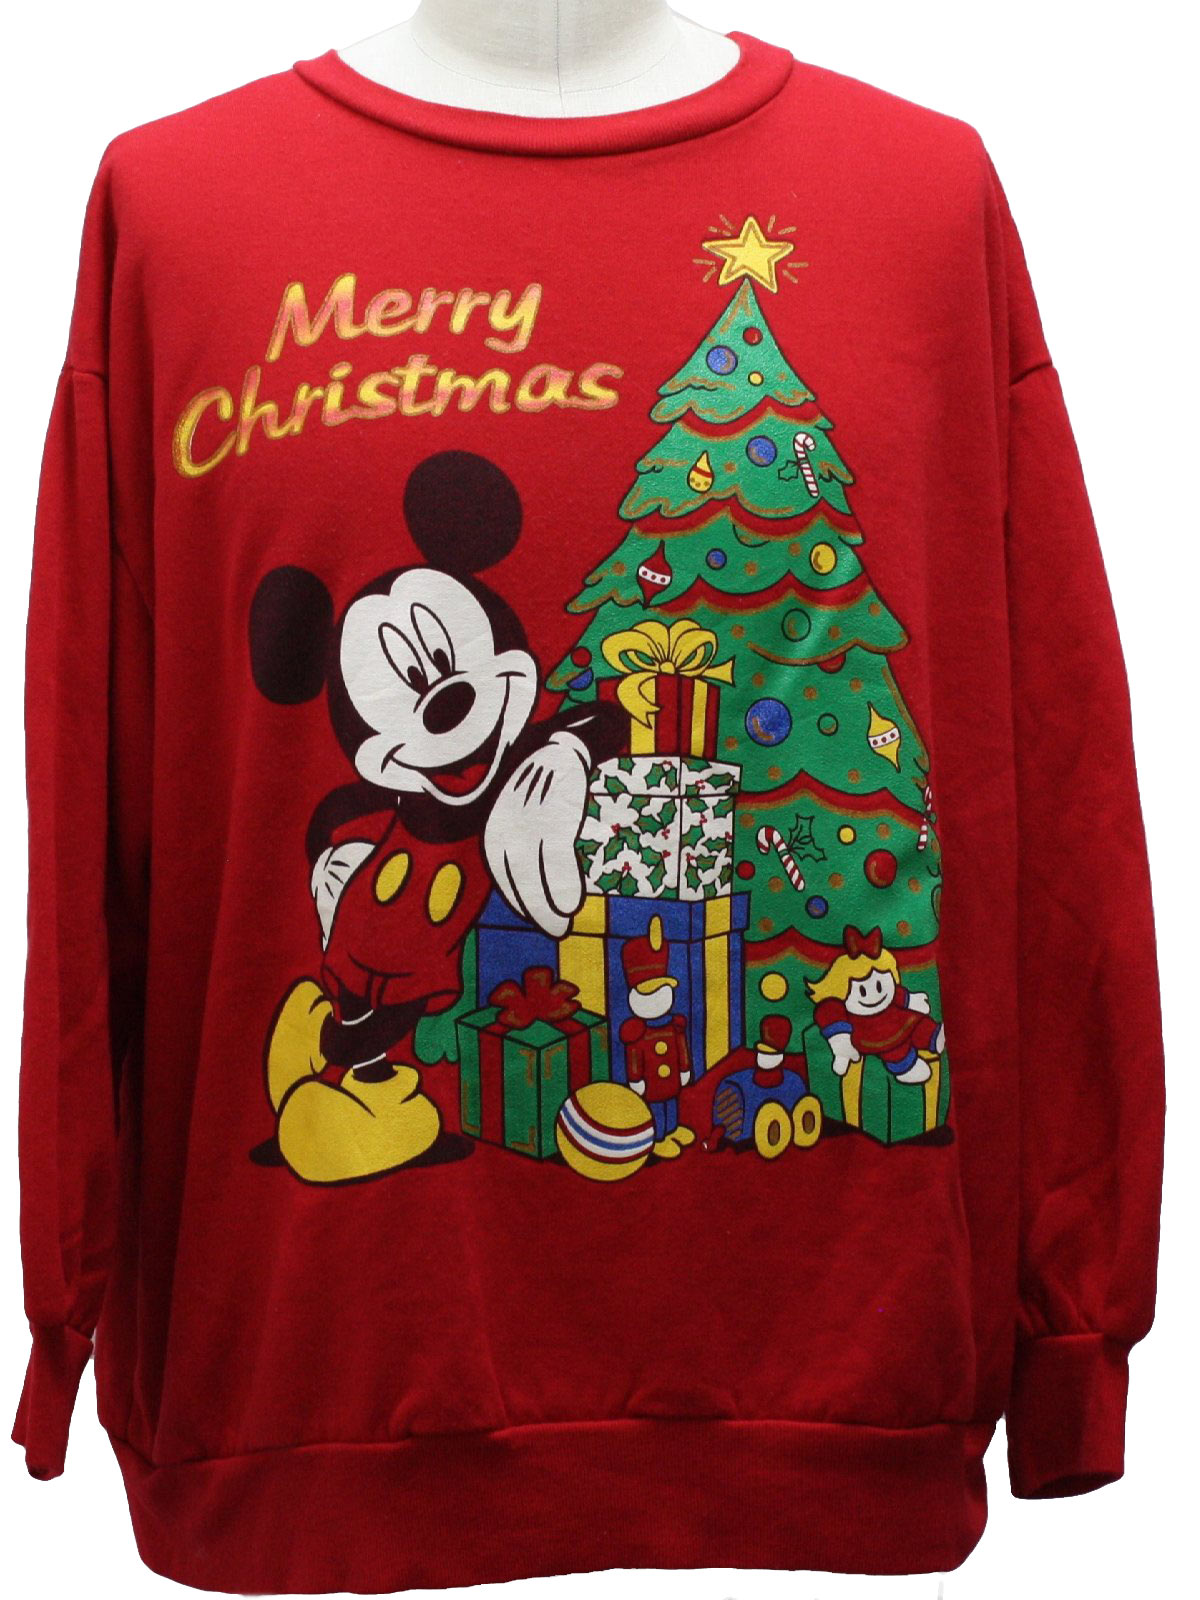 mickey mouse ugly christmas sweatshirt mickey unisex red background acrylic longsleeve pullover ugly christmas sweatshirt with mickey mouse leaning - Mickey Mouse Christmas Sweater